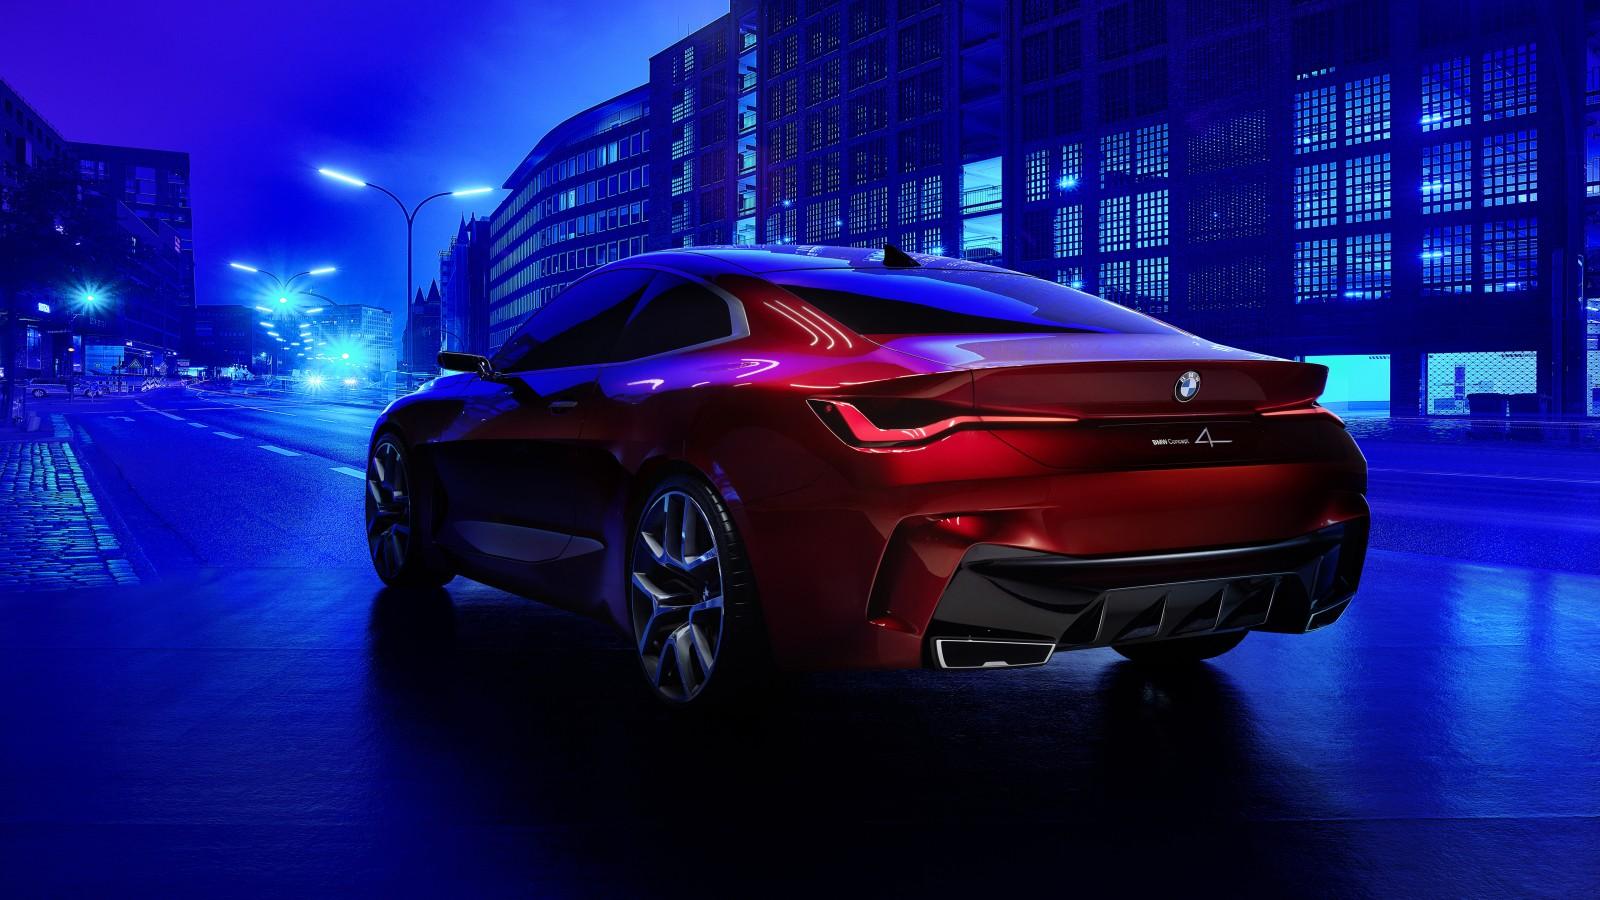 BMW Concept 4 2019 4K 10 Wallpaper